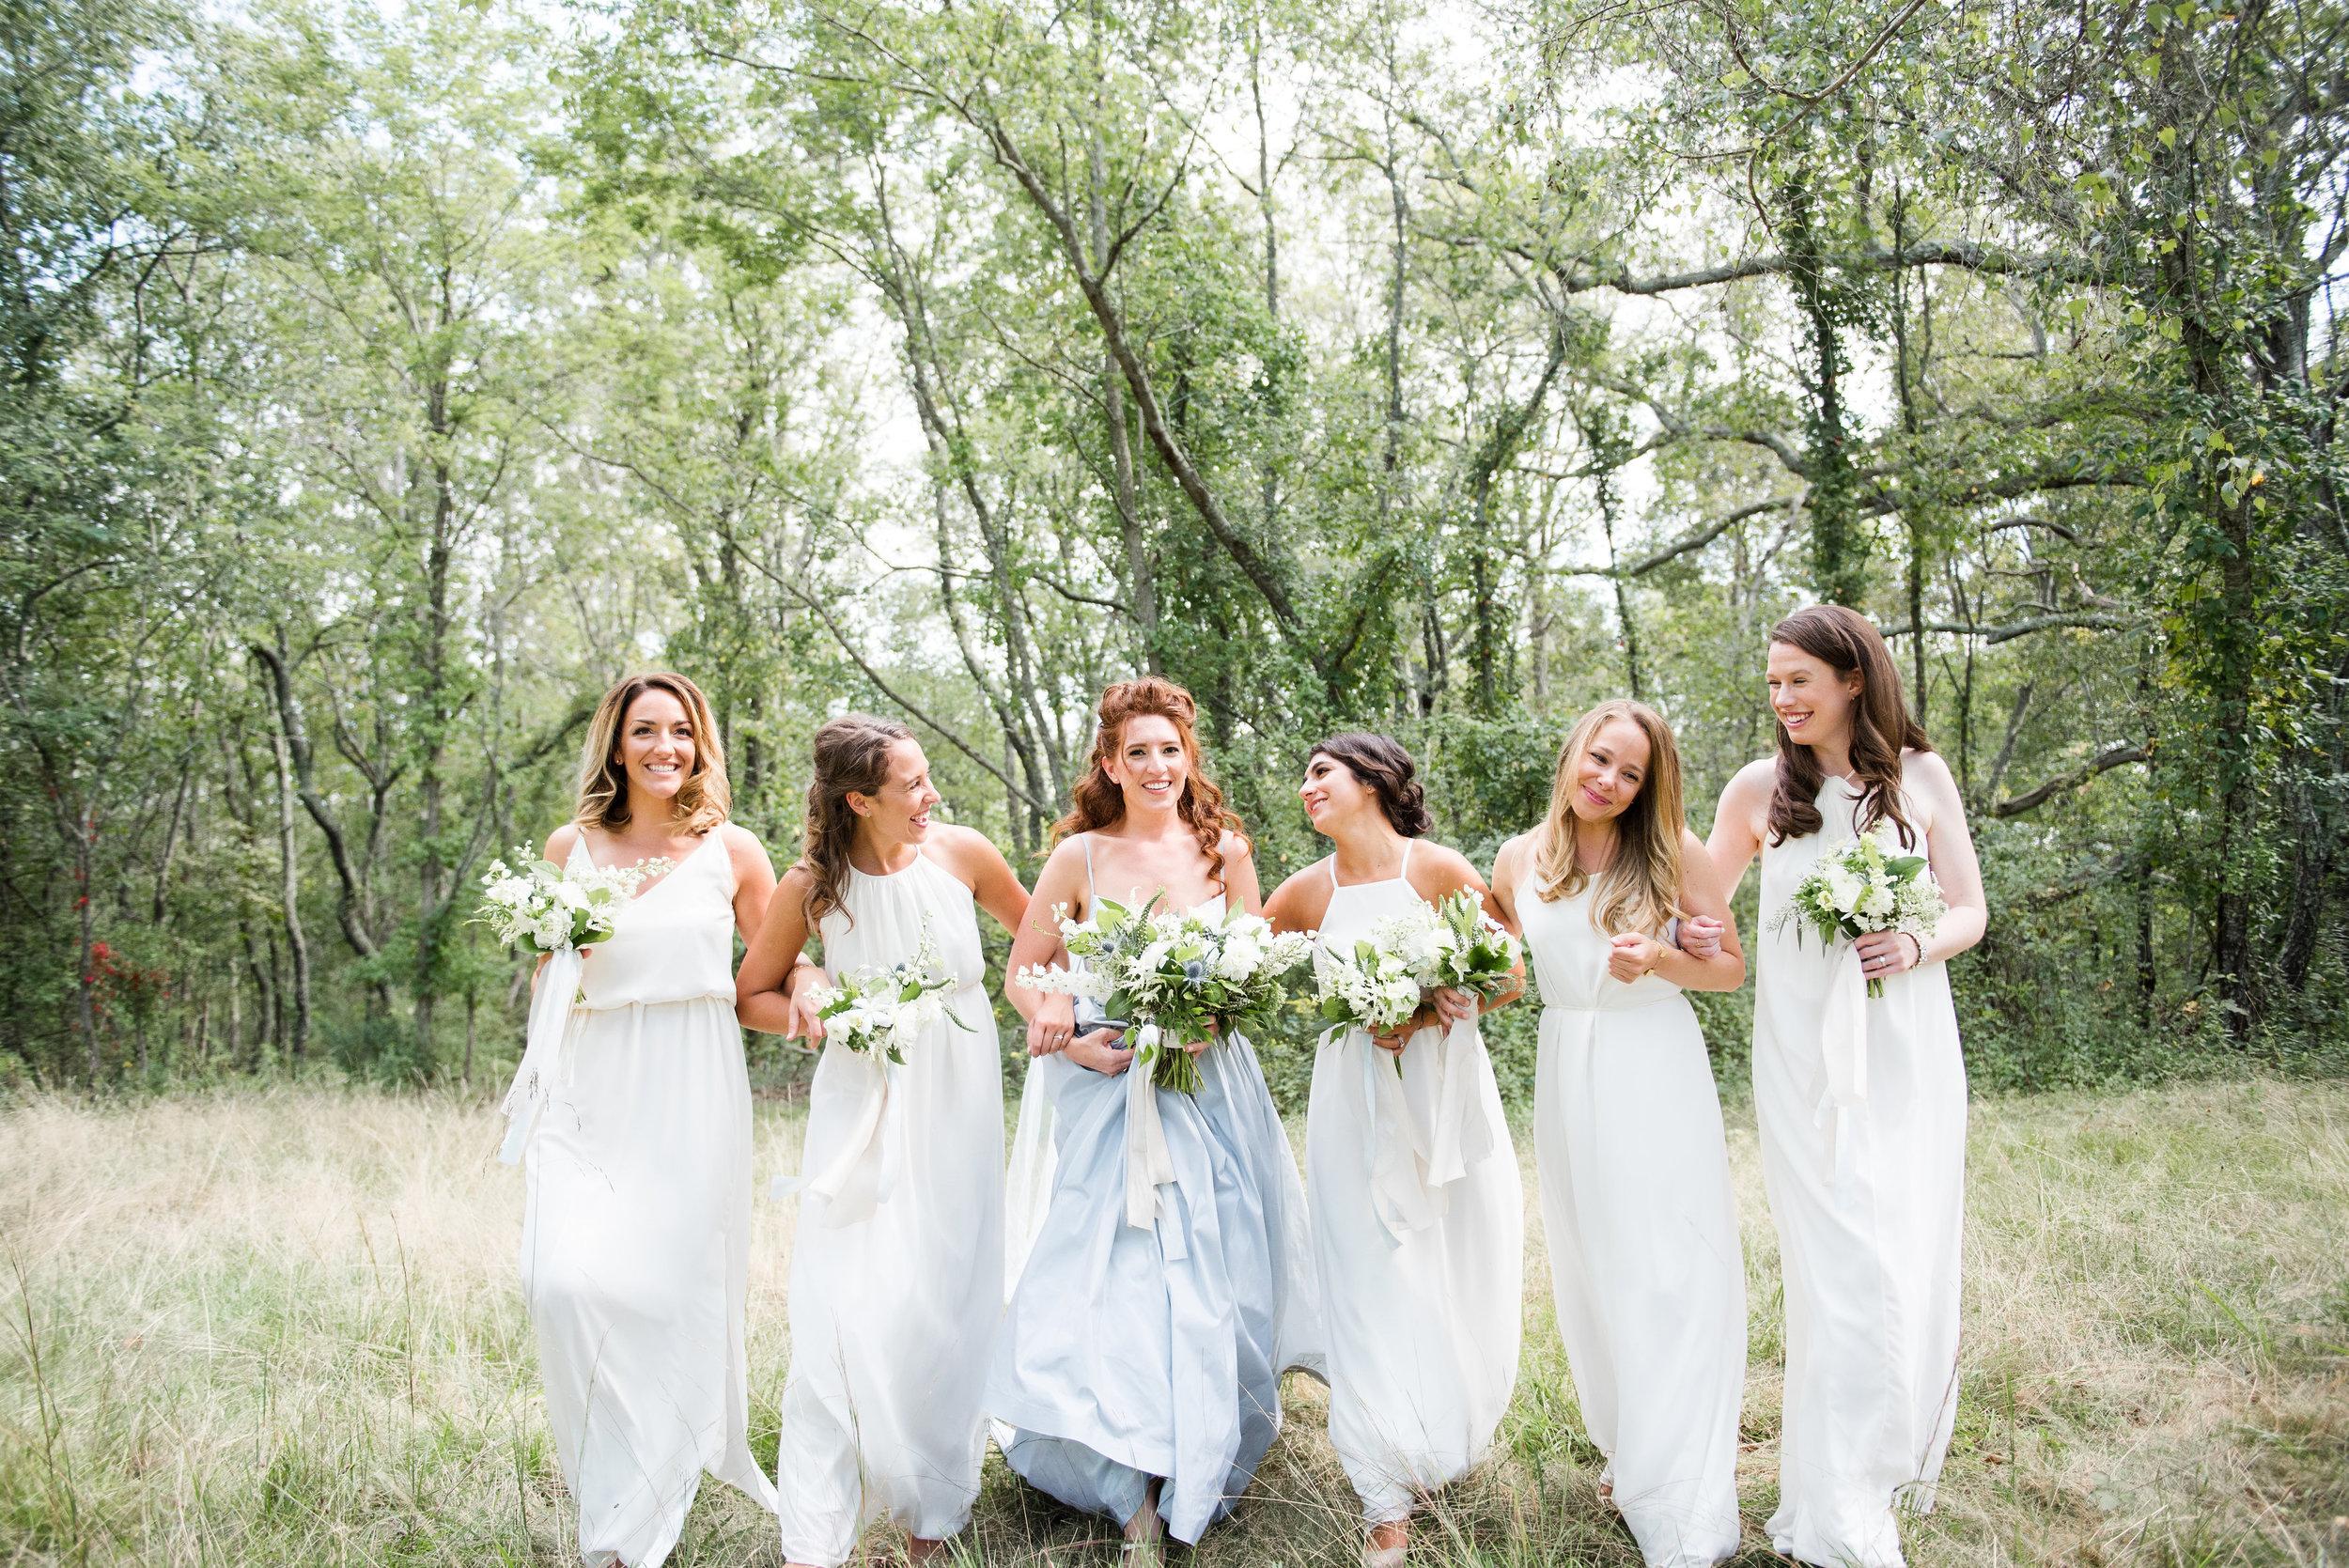 COPPER GEOMETRIC WEDDING LACE FACTORY WEDDING_034.jpg